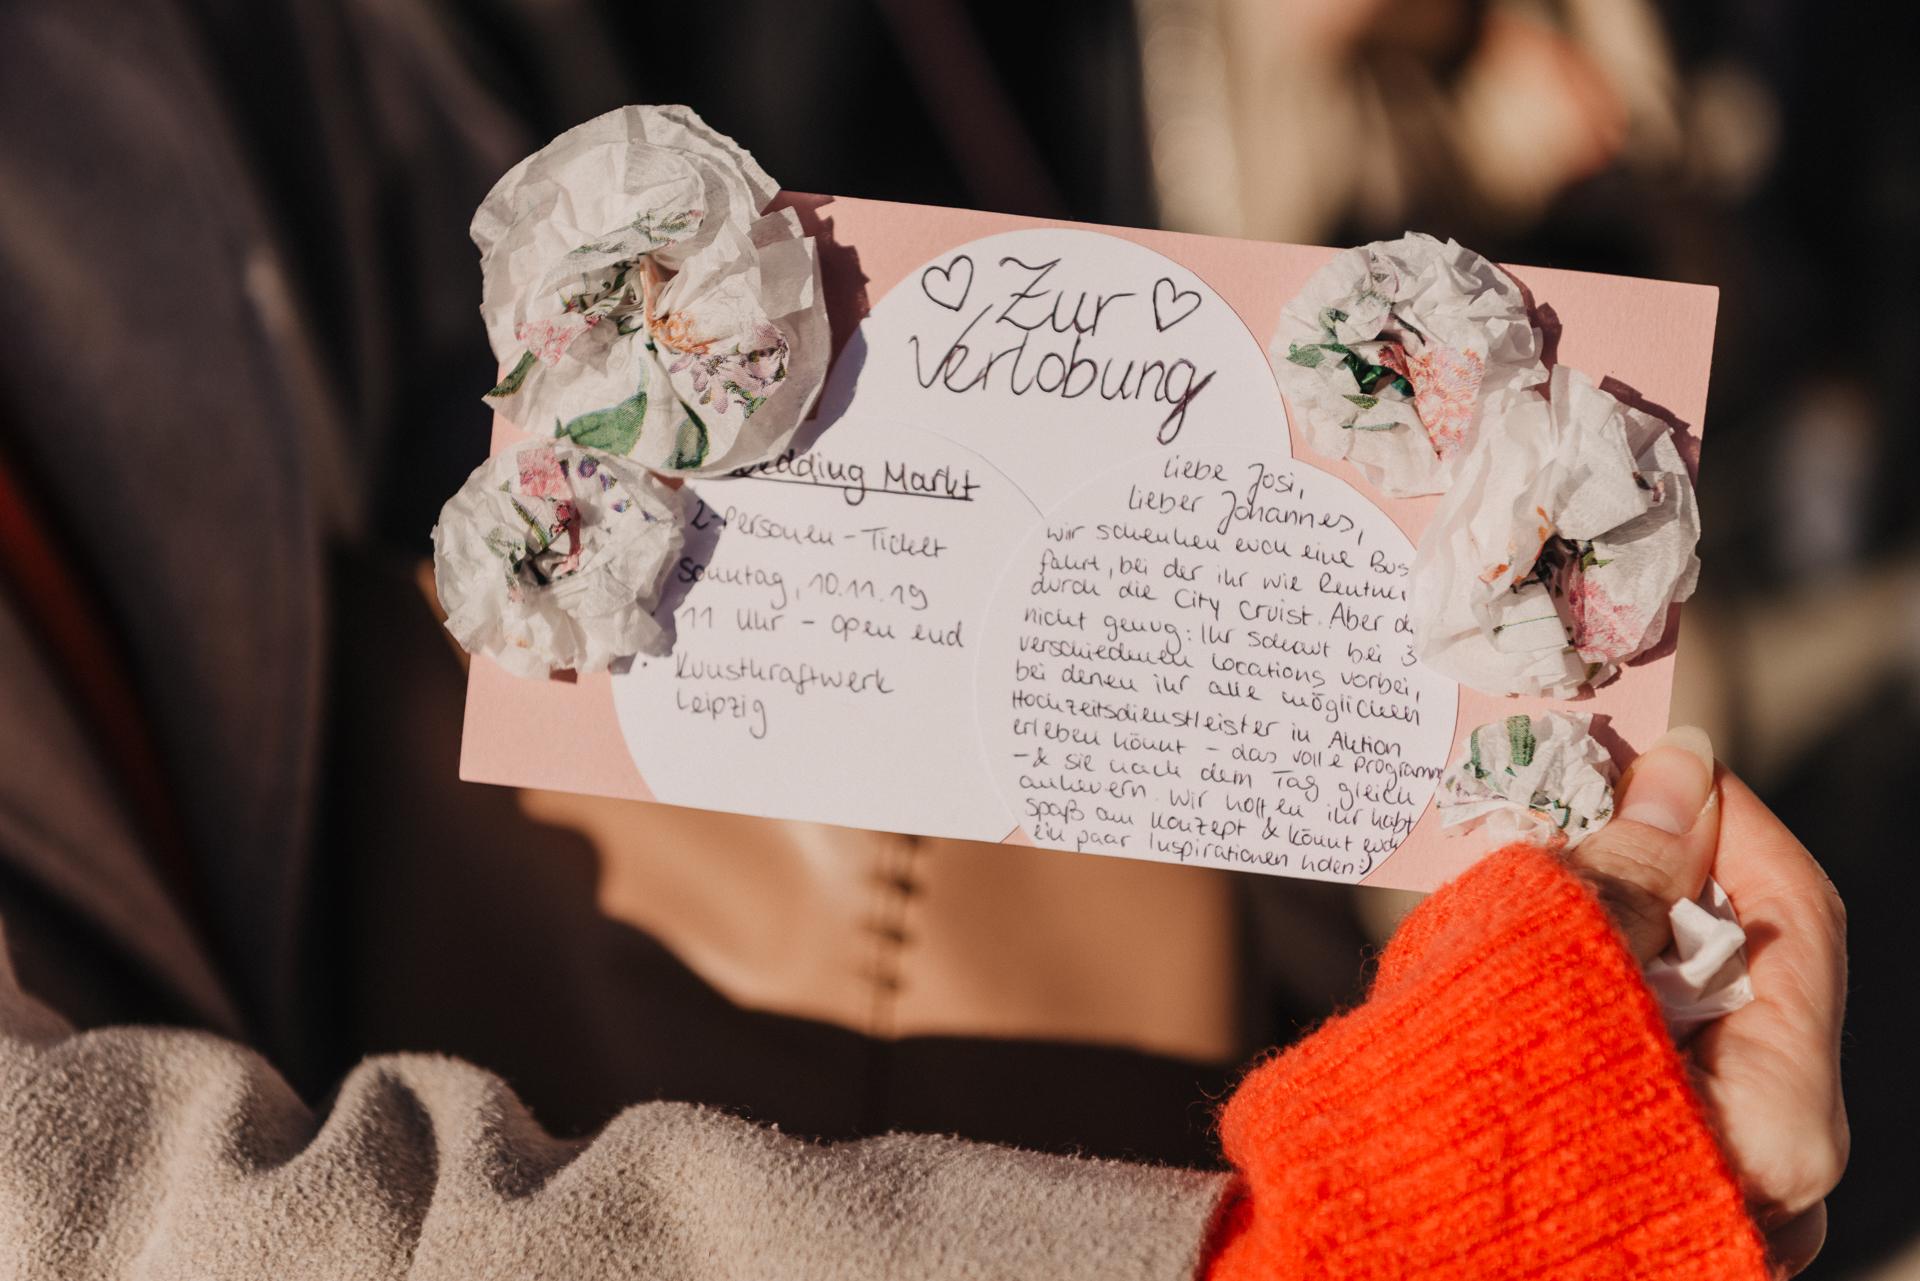 Zweinander-LeonoreHerzog-WeddingMarket-OnTour20191110-8537